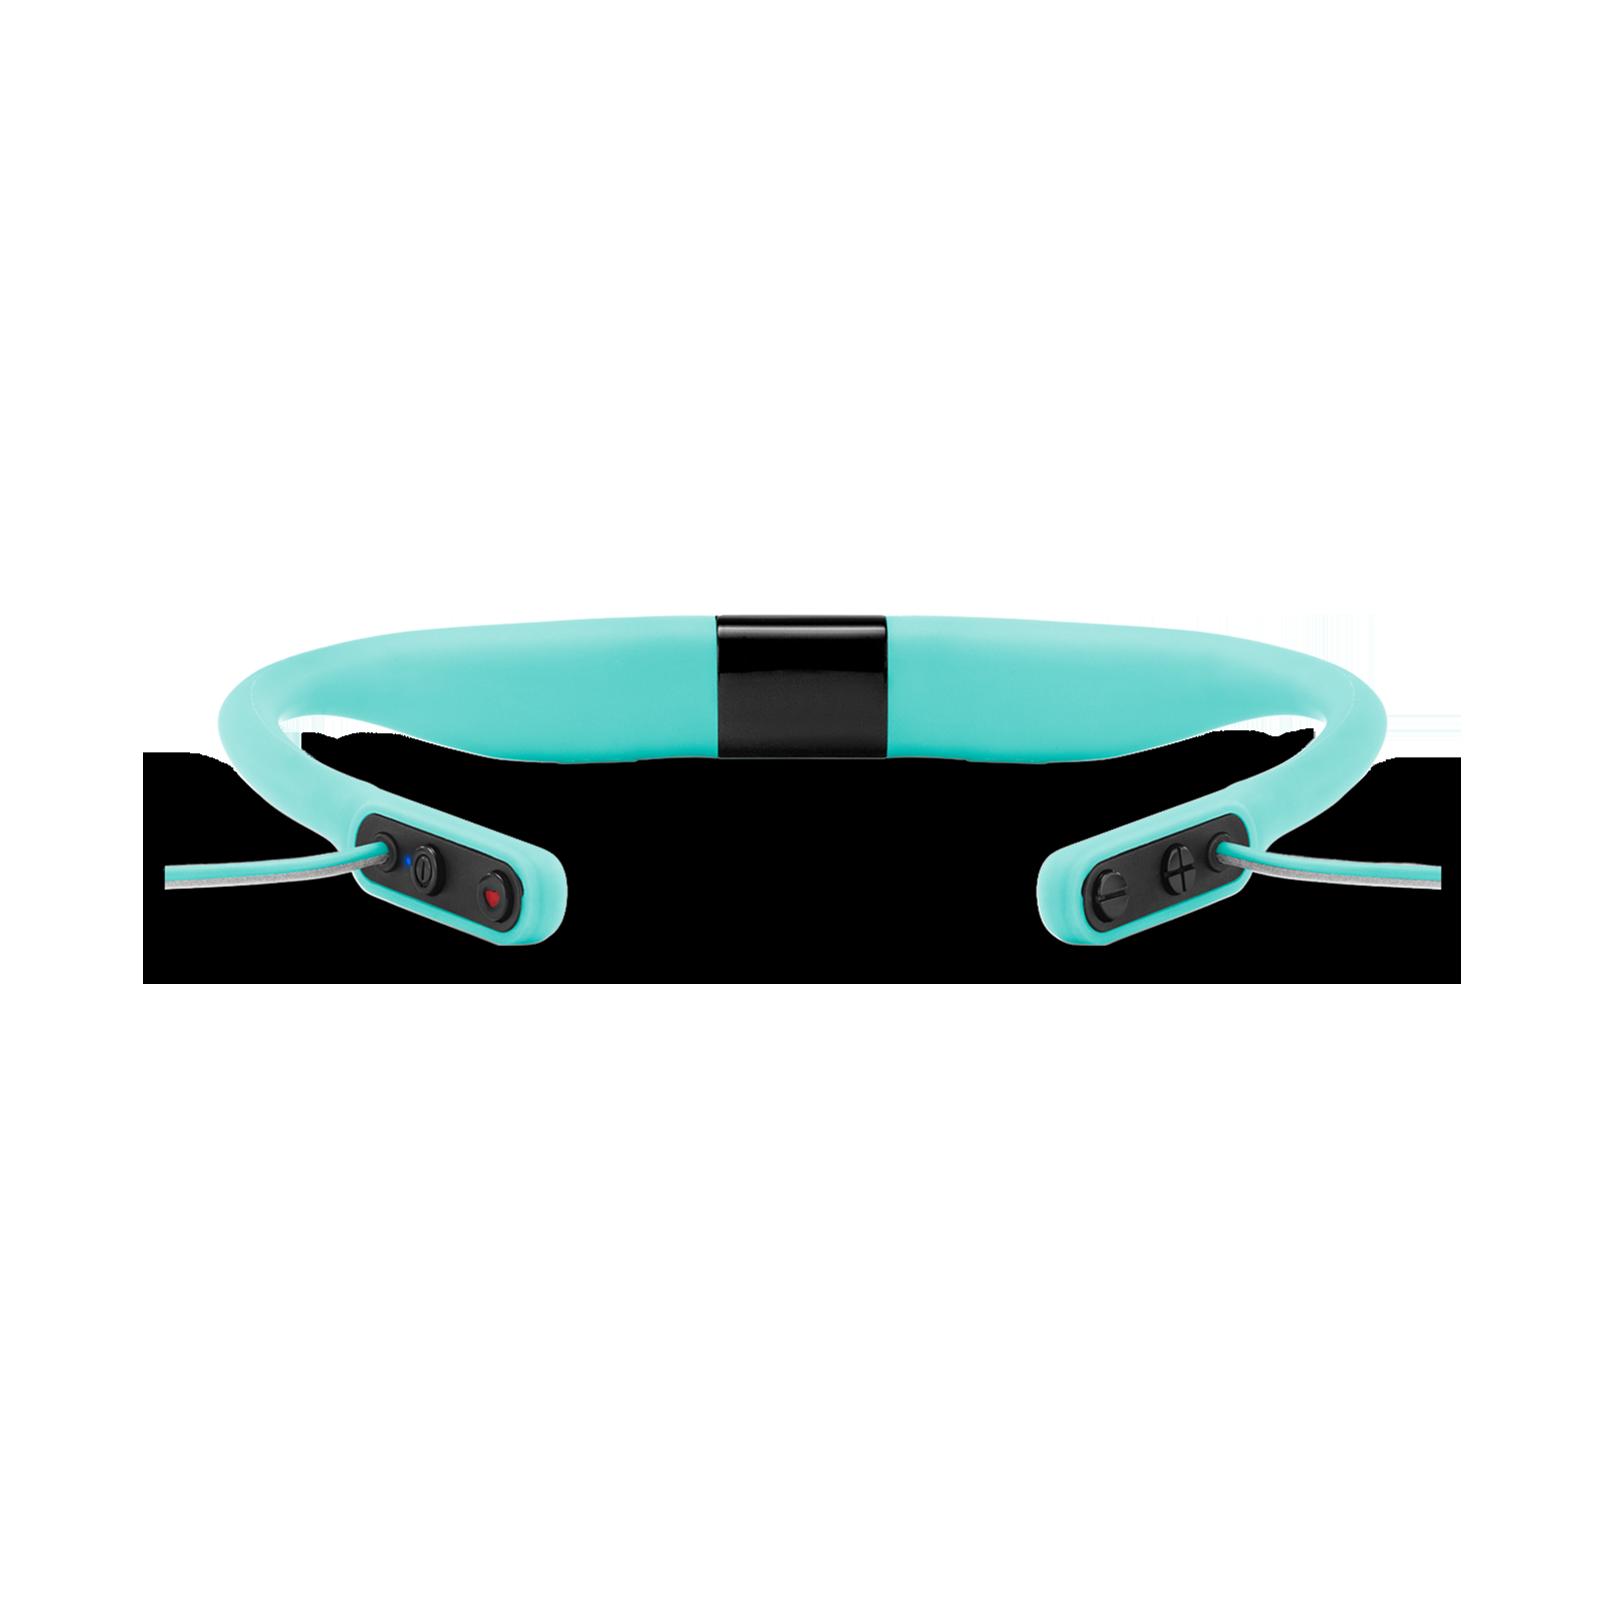 JBL Reflect Fit - Teal - Heart Rate Wireless Headphones - Detailshot 2